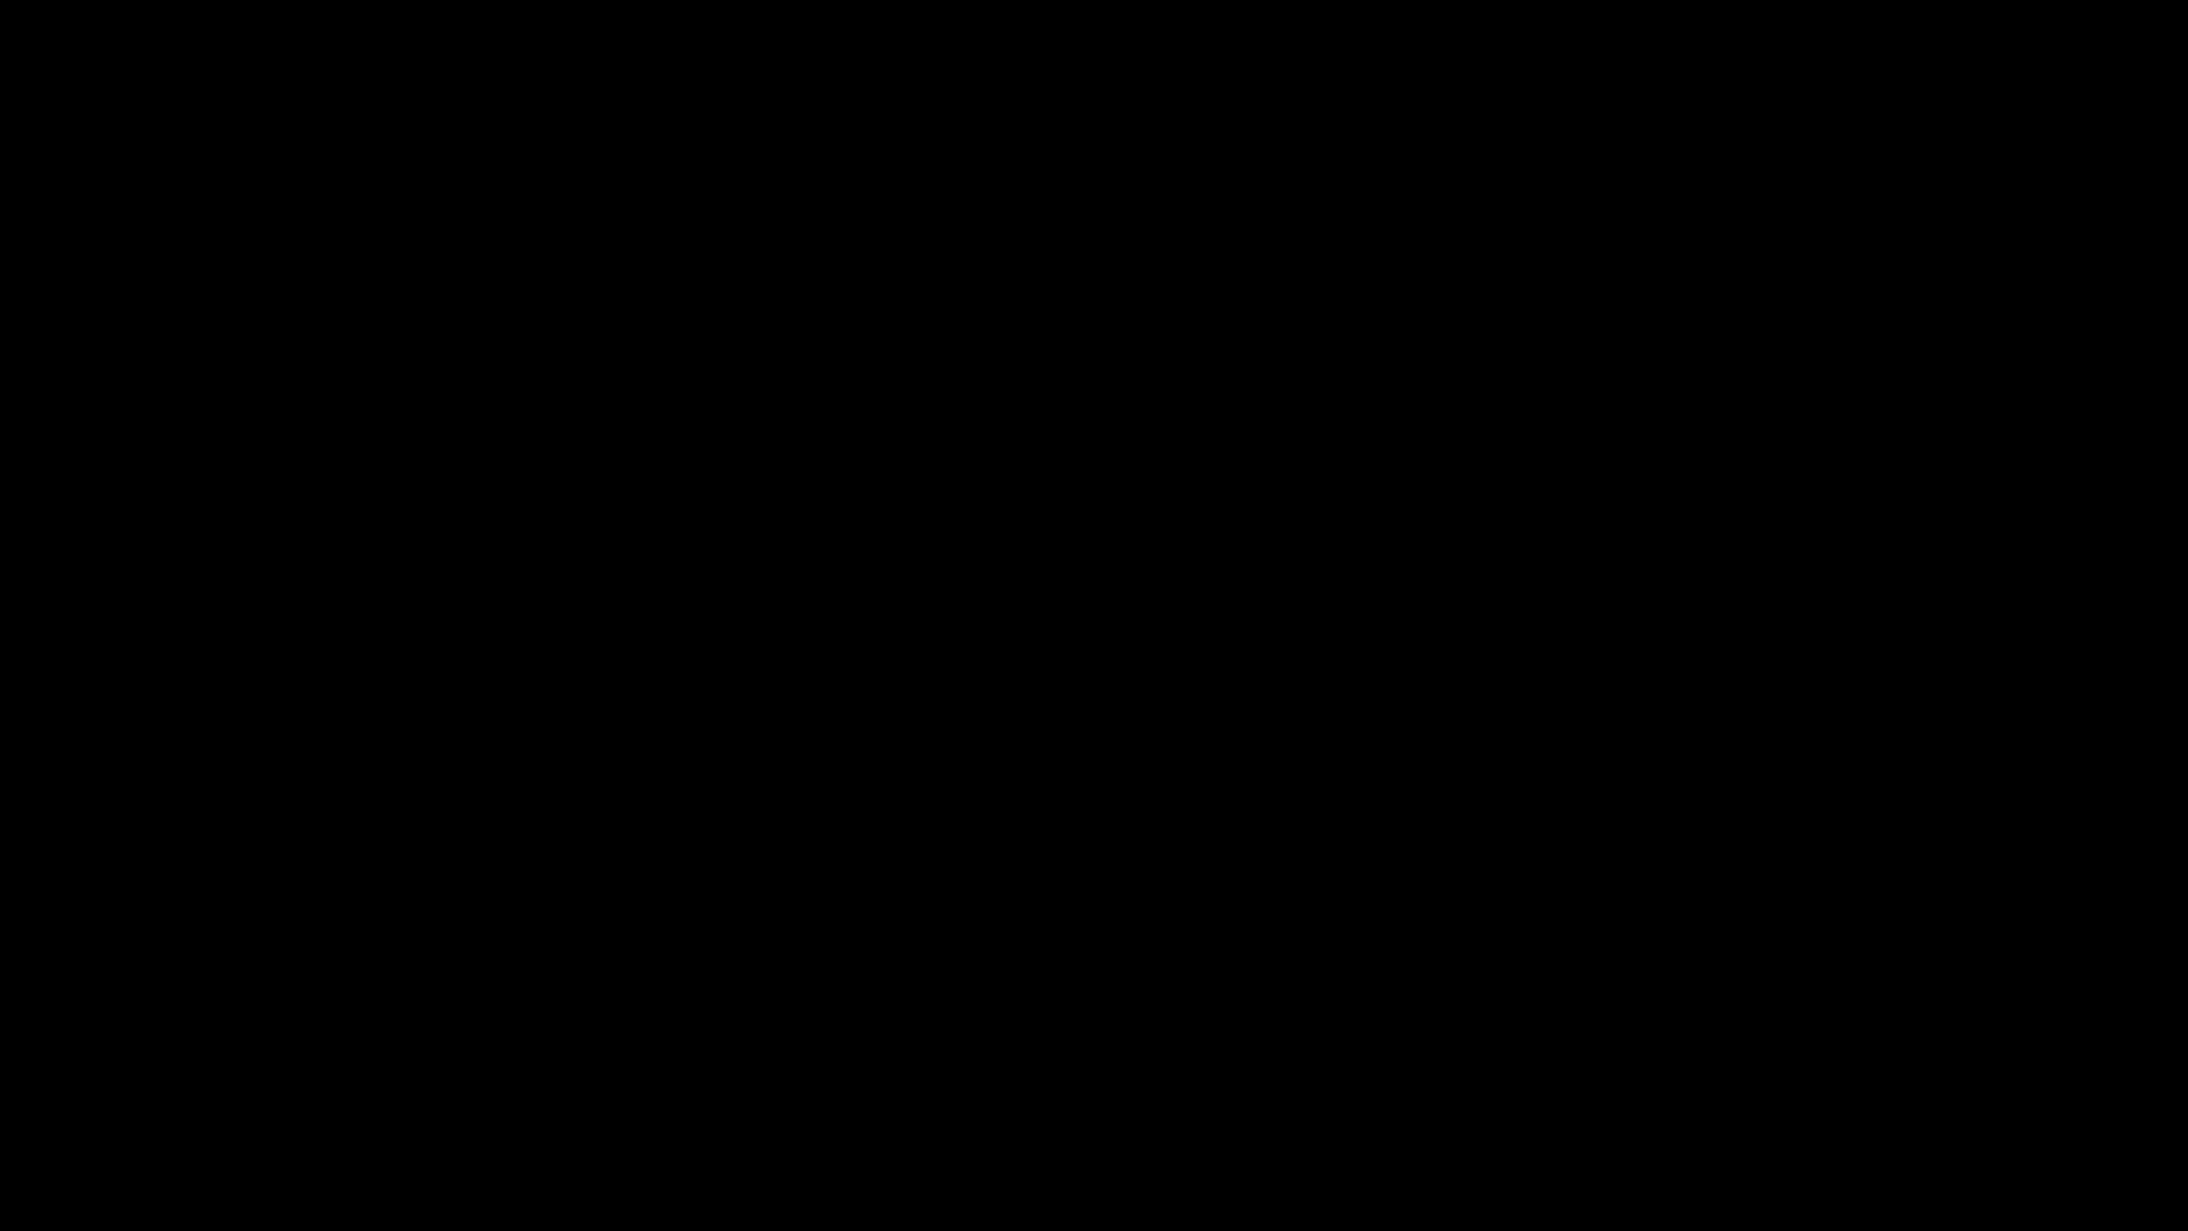 aura-botanica-kerastase-plano-frisco-dallas-allen-mckinney-addison-tx-dfw-aalam-